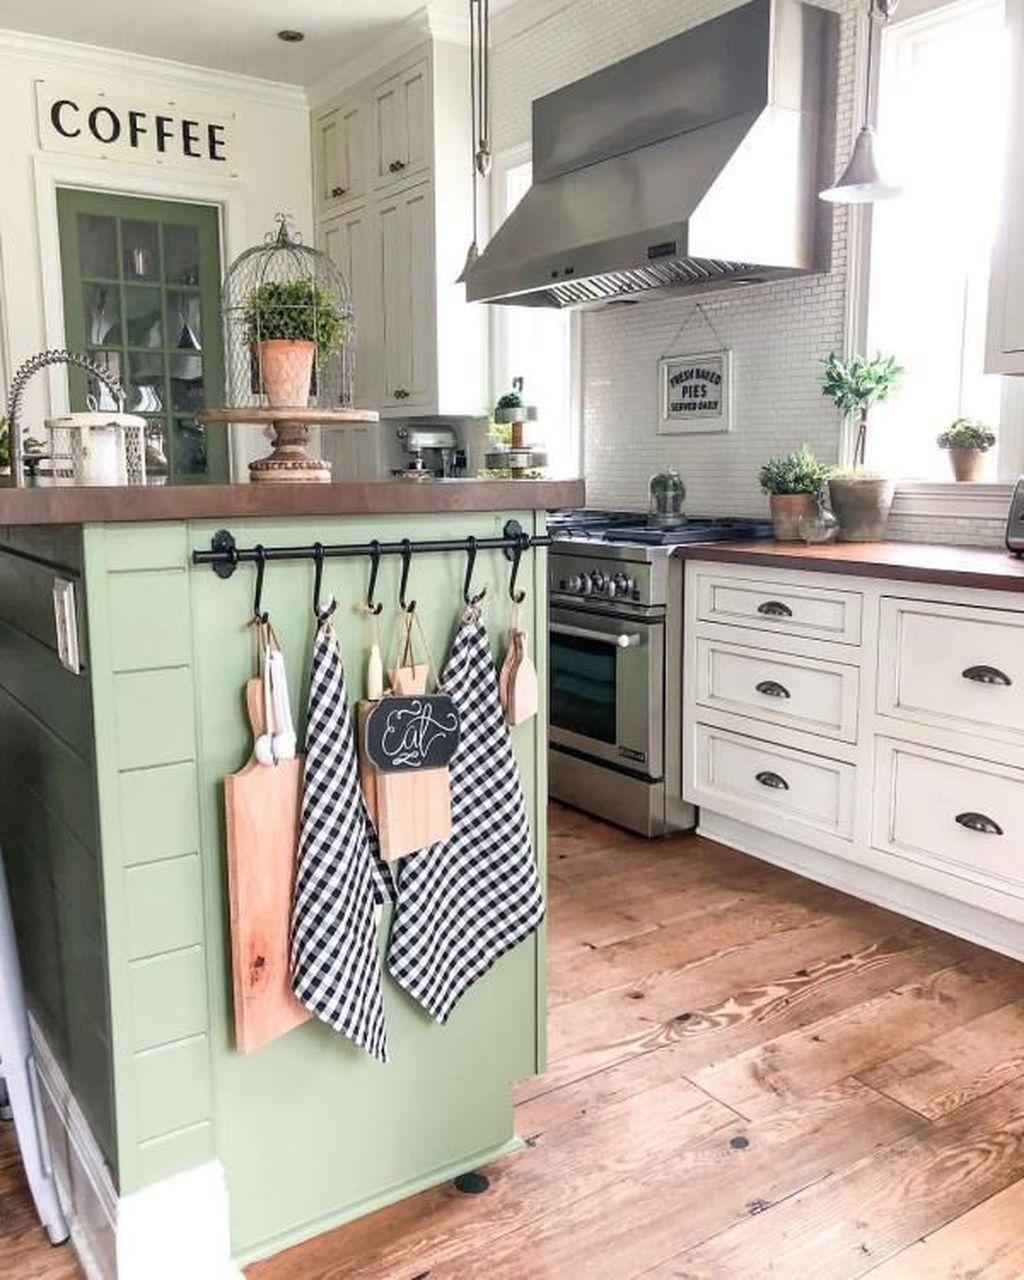 The Best Farmhouse Kitchen Decor Ideas 19